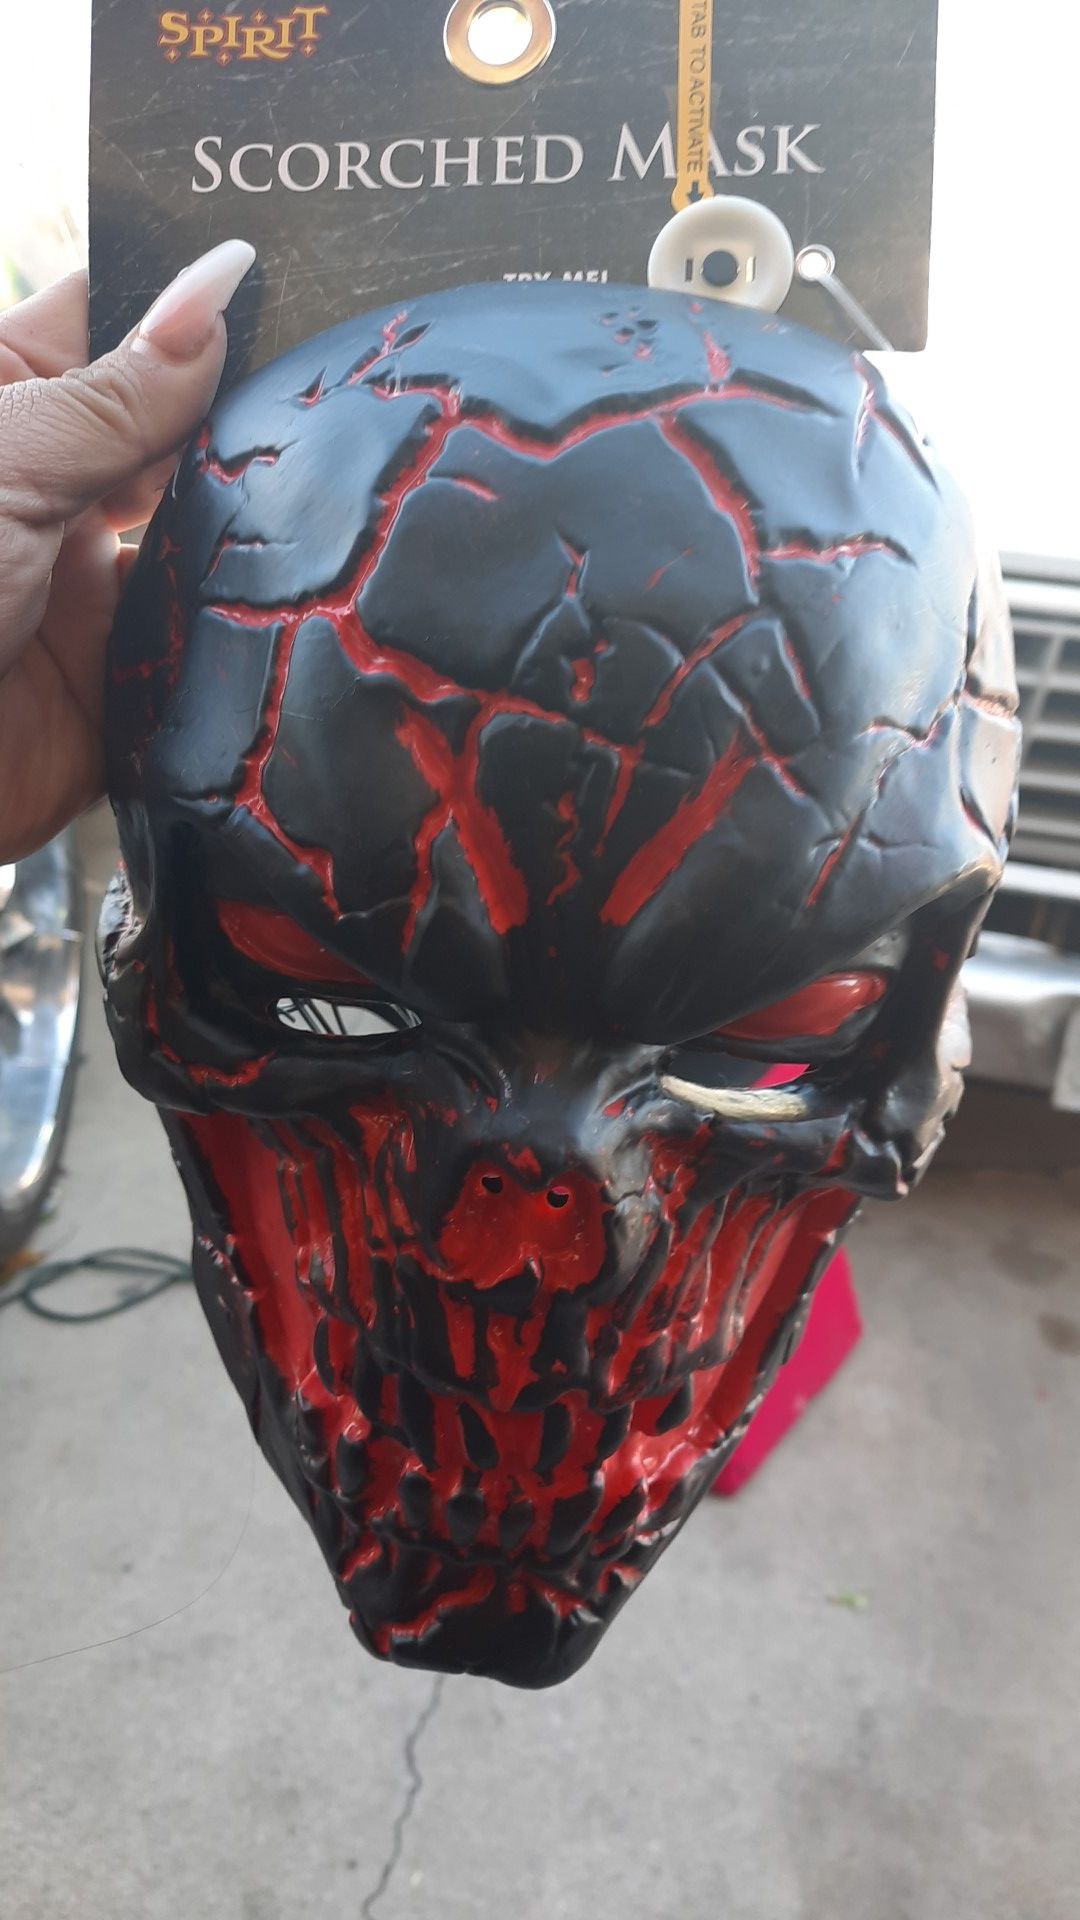 Led scorched mask